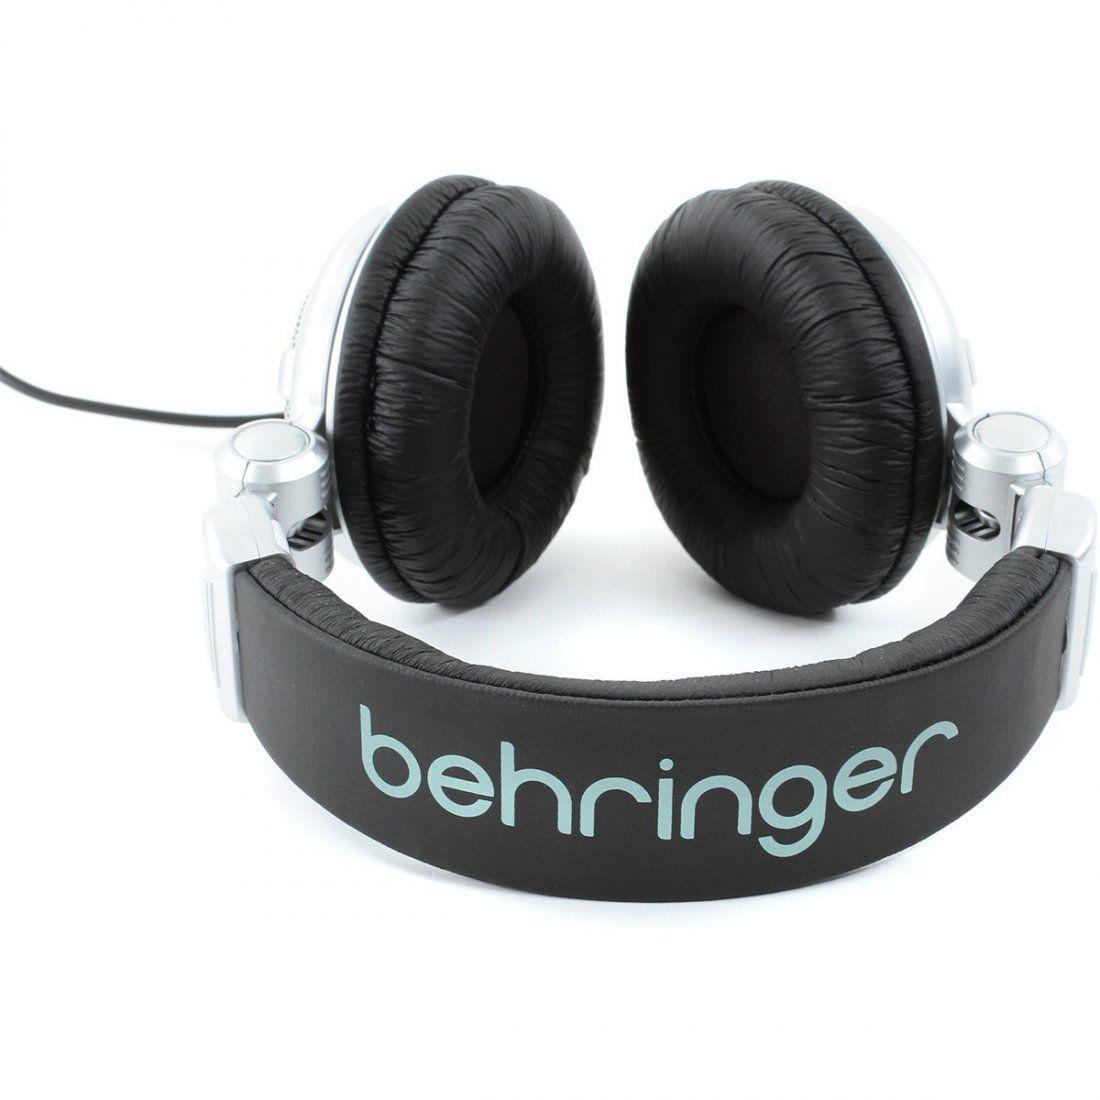 Behringer HPX-2000 Fone de Ouvido HPX2000 Semi-Fechado para Dj Profissional